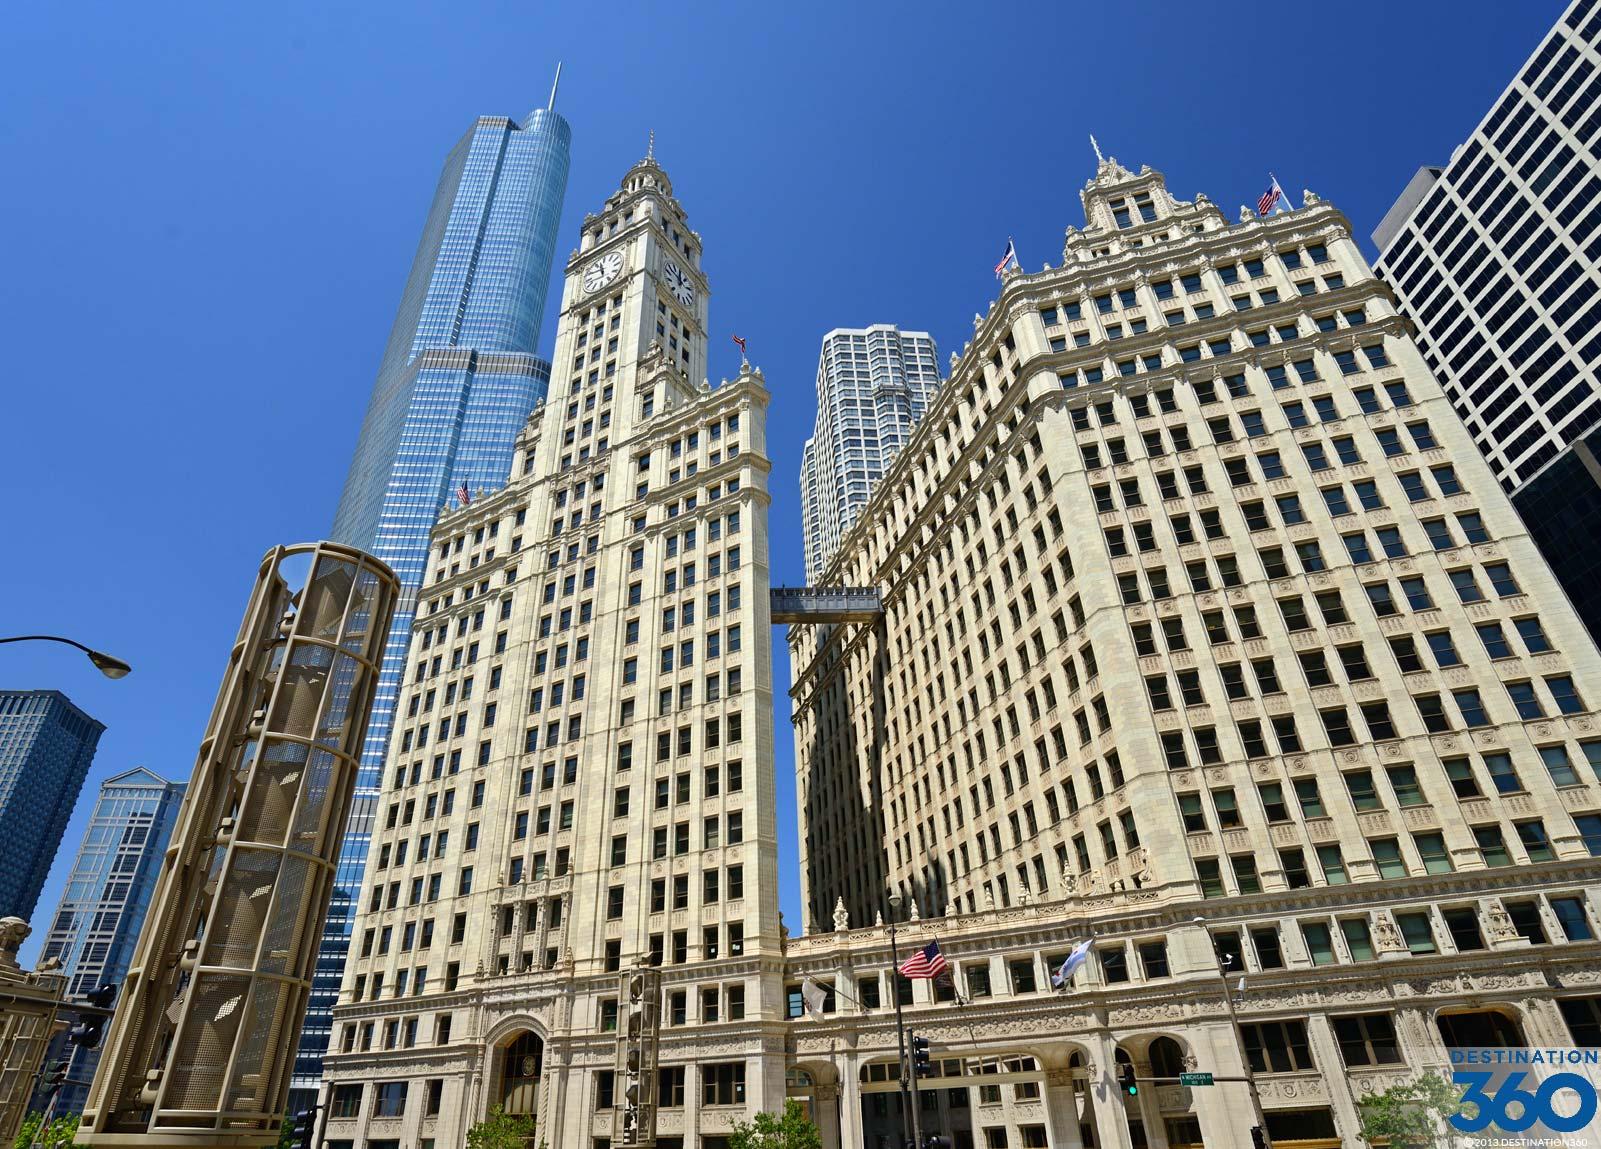 Chicago Architectural Tour  Architecture Tour In Chicago